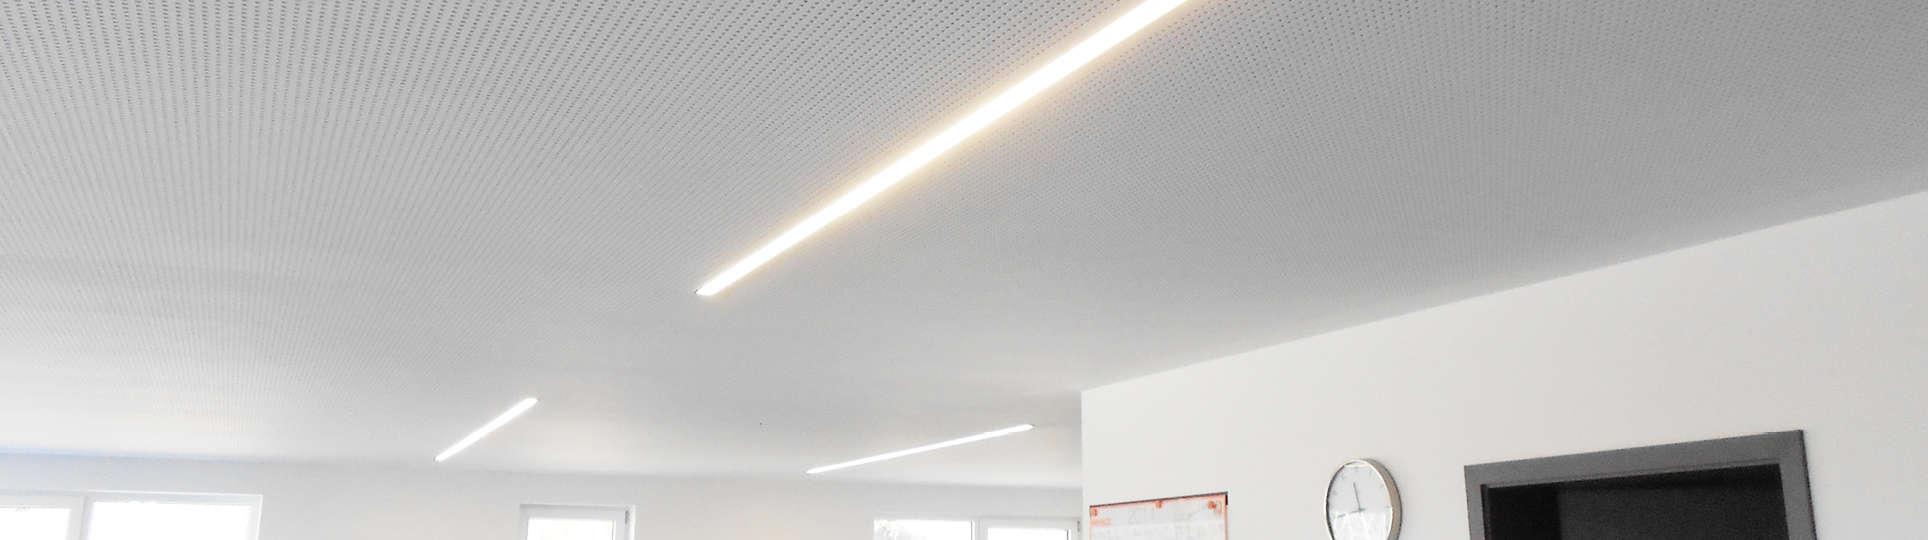 Slider_Referenz_Line-Light_1928x54013